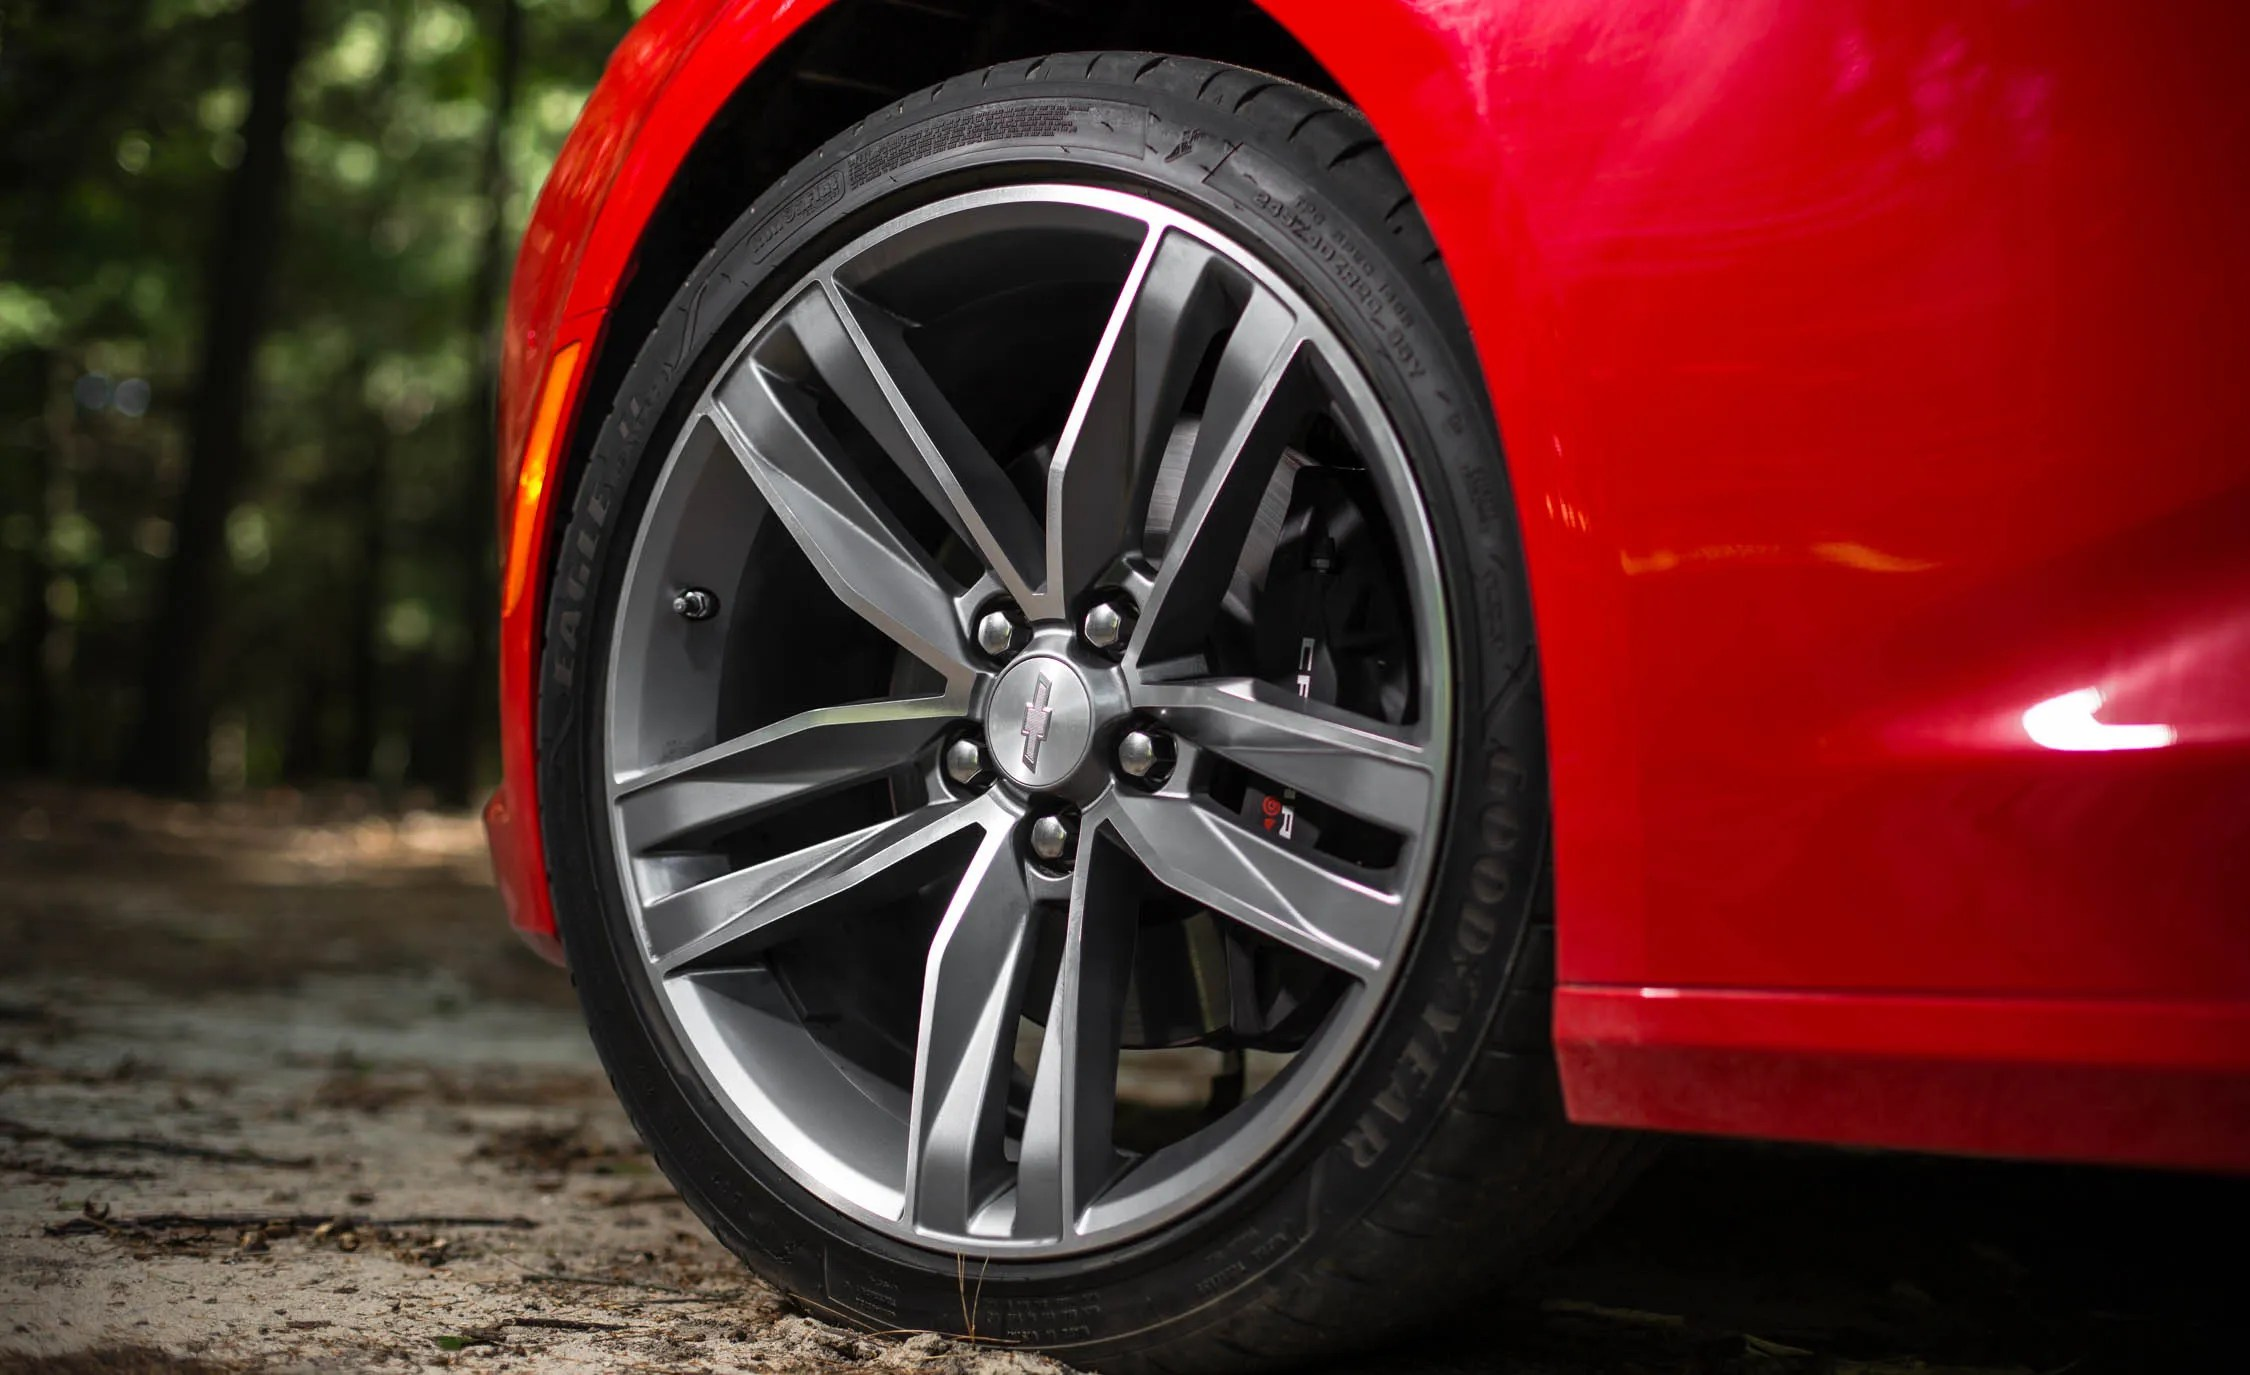 2016 Chevrolet Camaro SS Exterior Wheel